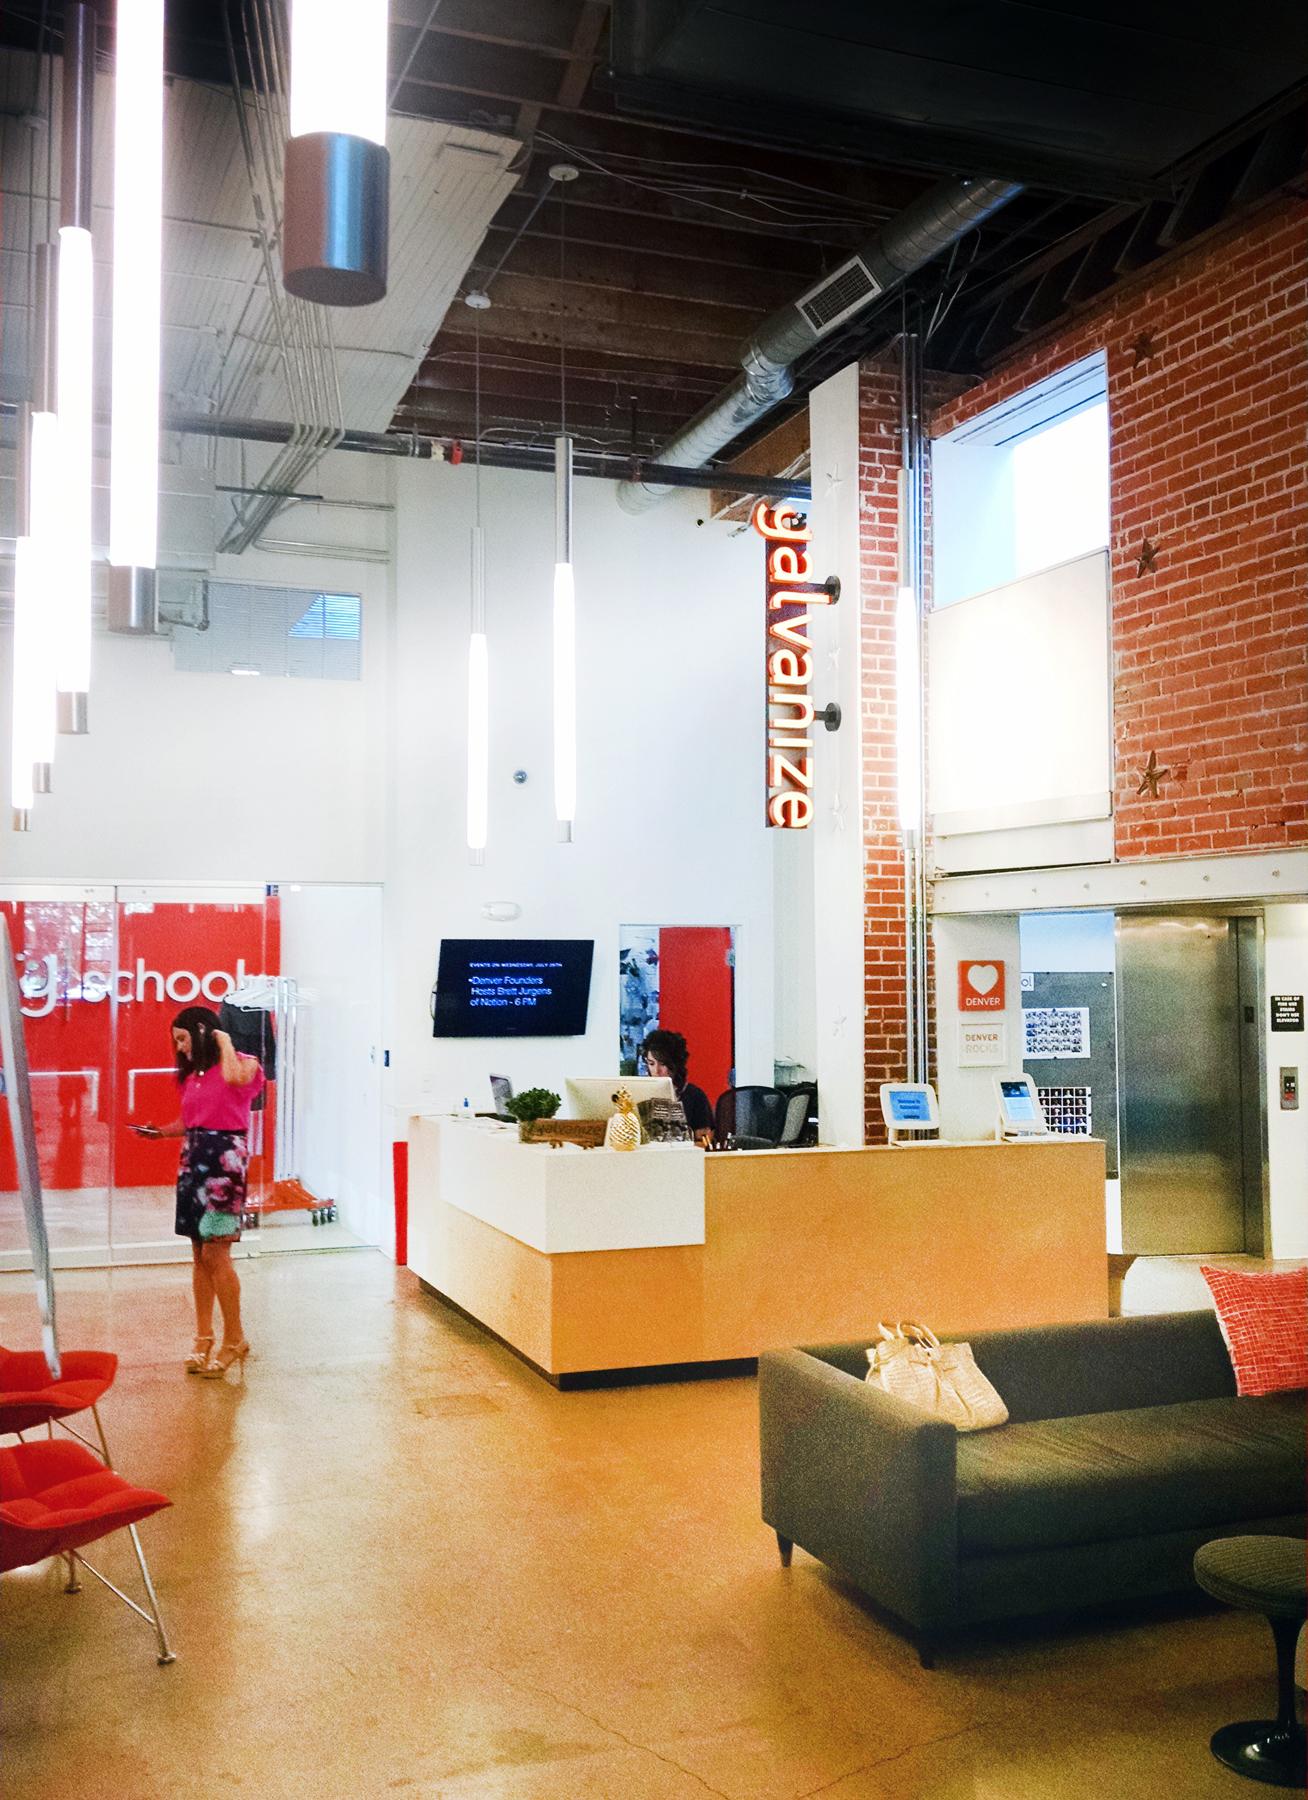 galvanize 1.0 adaptive reuse cowork lobby open studio architecture OSA